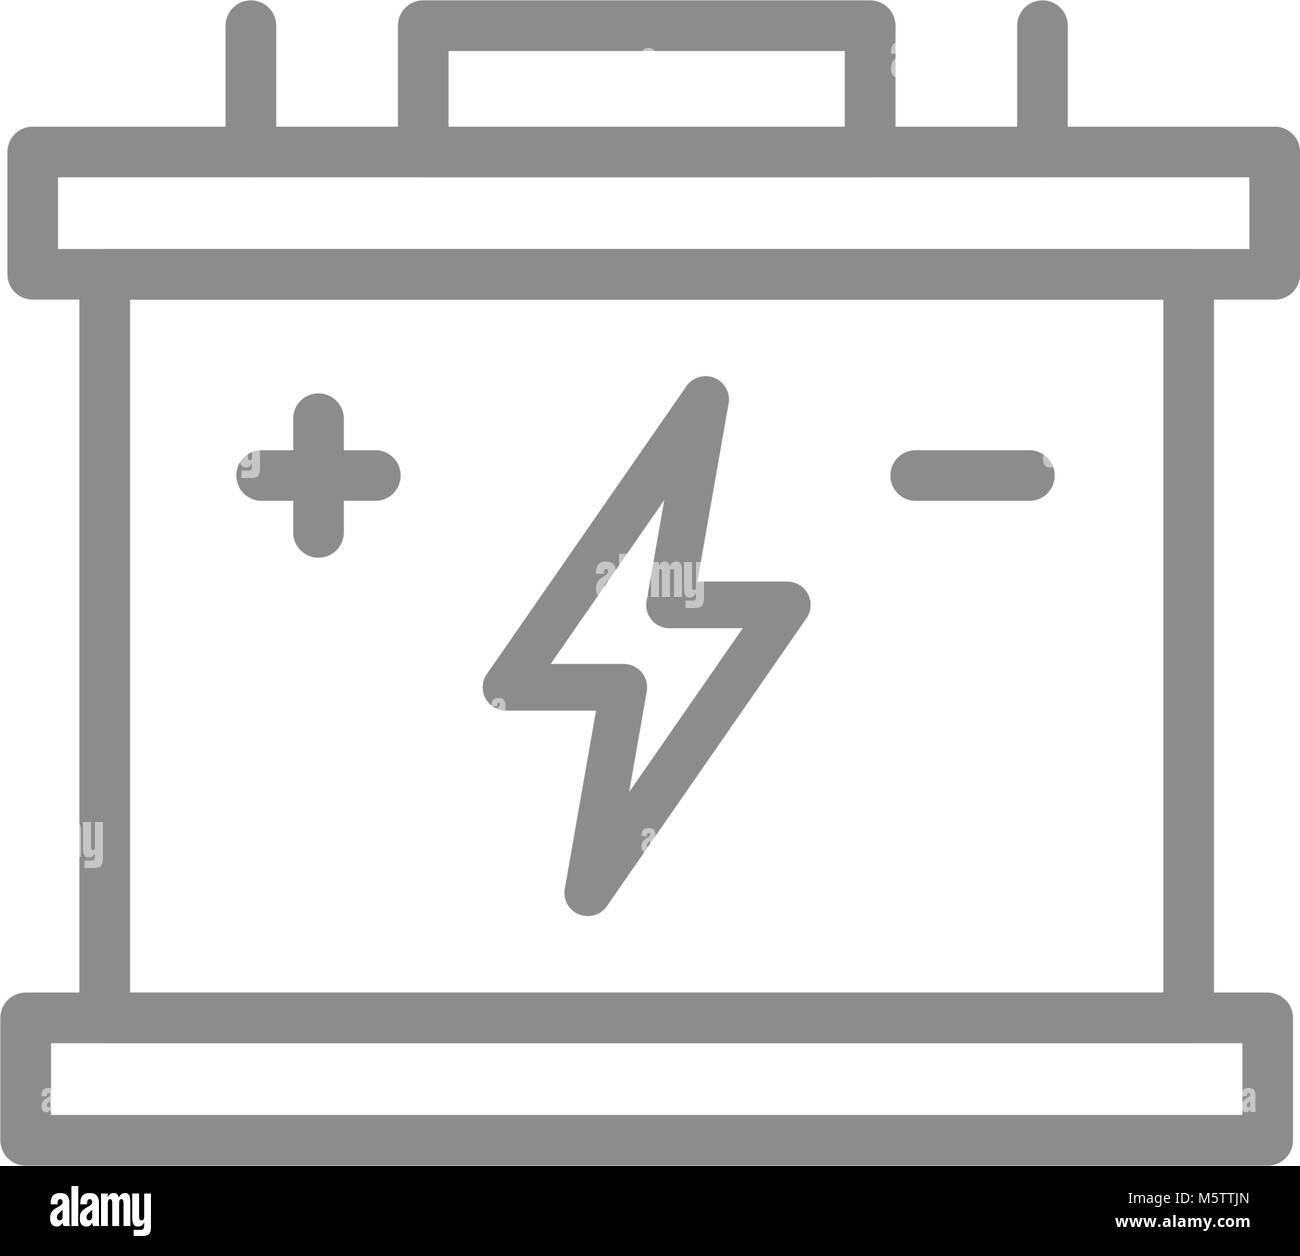 Battery Acid Stock Photos Amp Battery Acid Stock Images Alamy